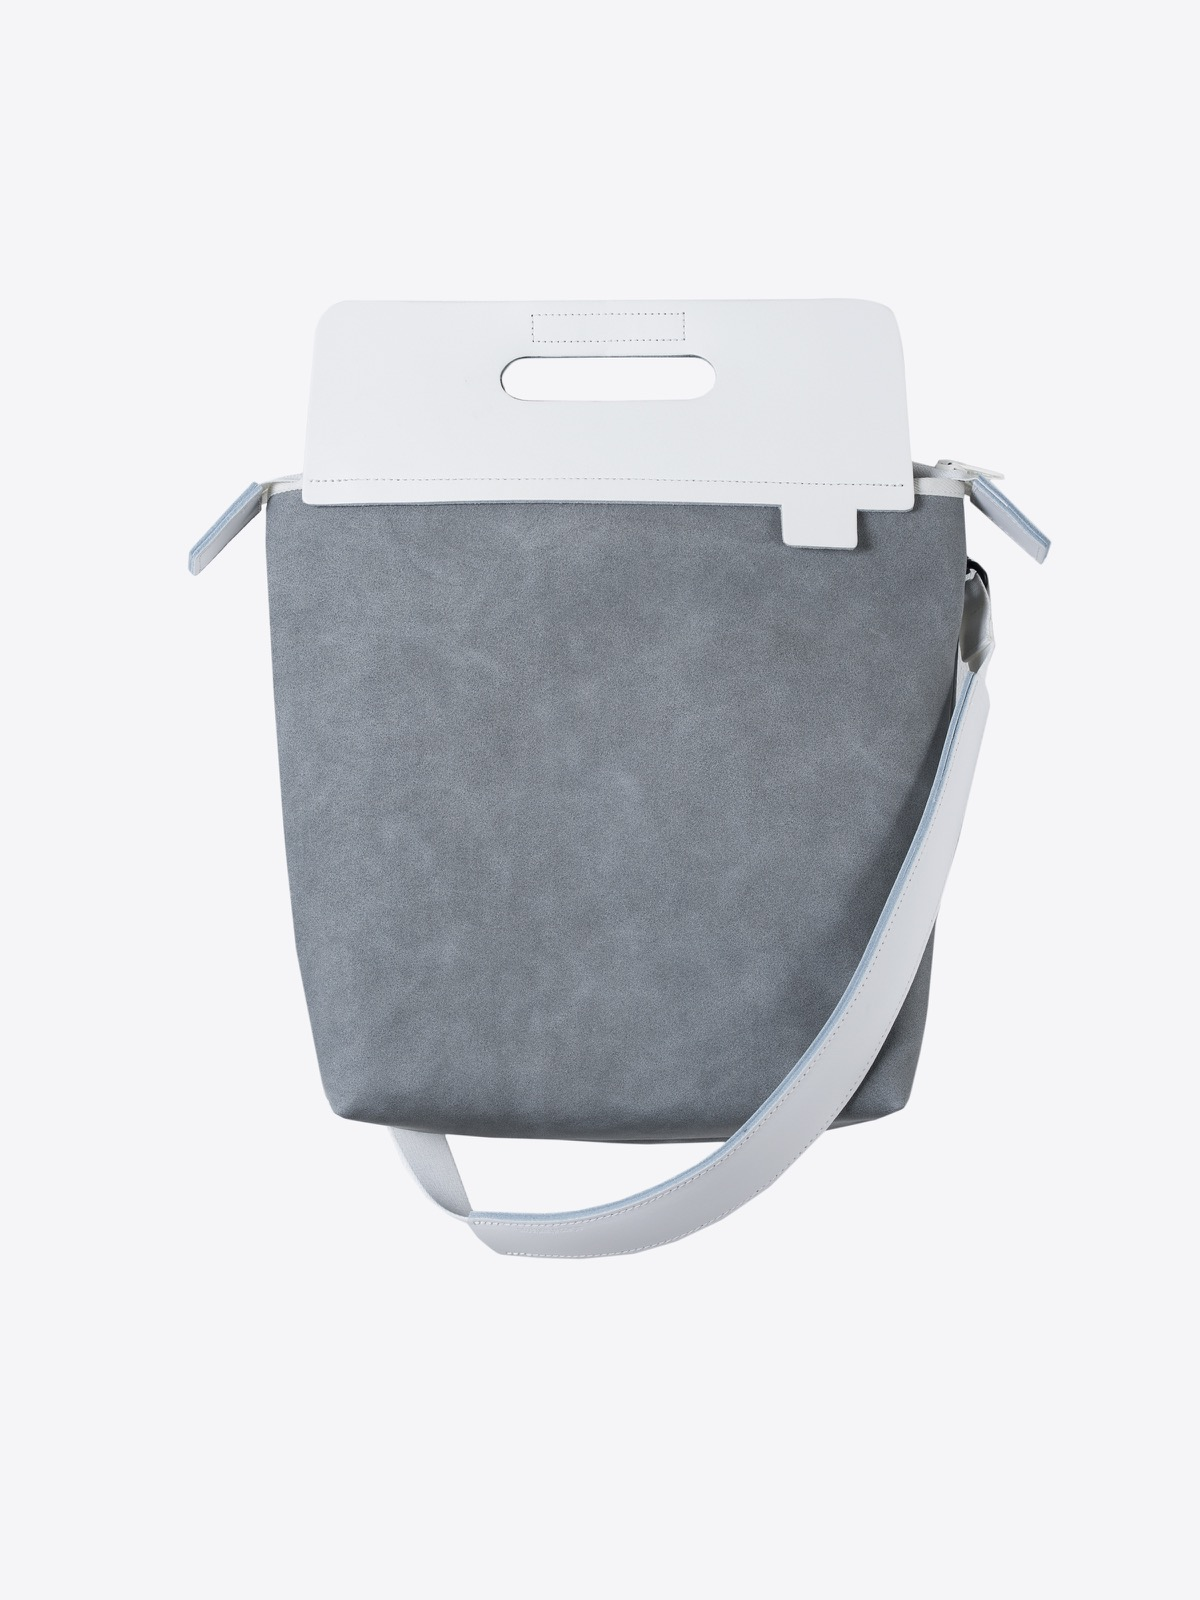 A2 dlx magnetic | grey